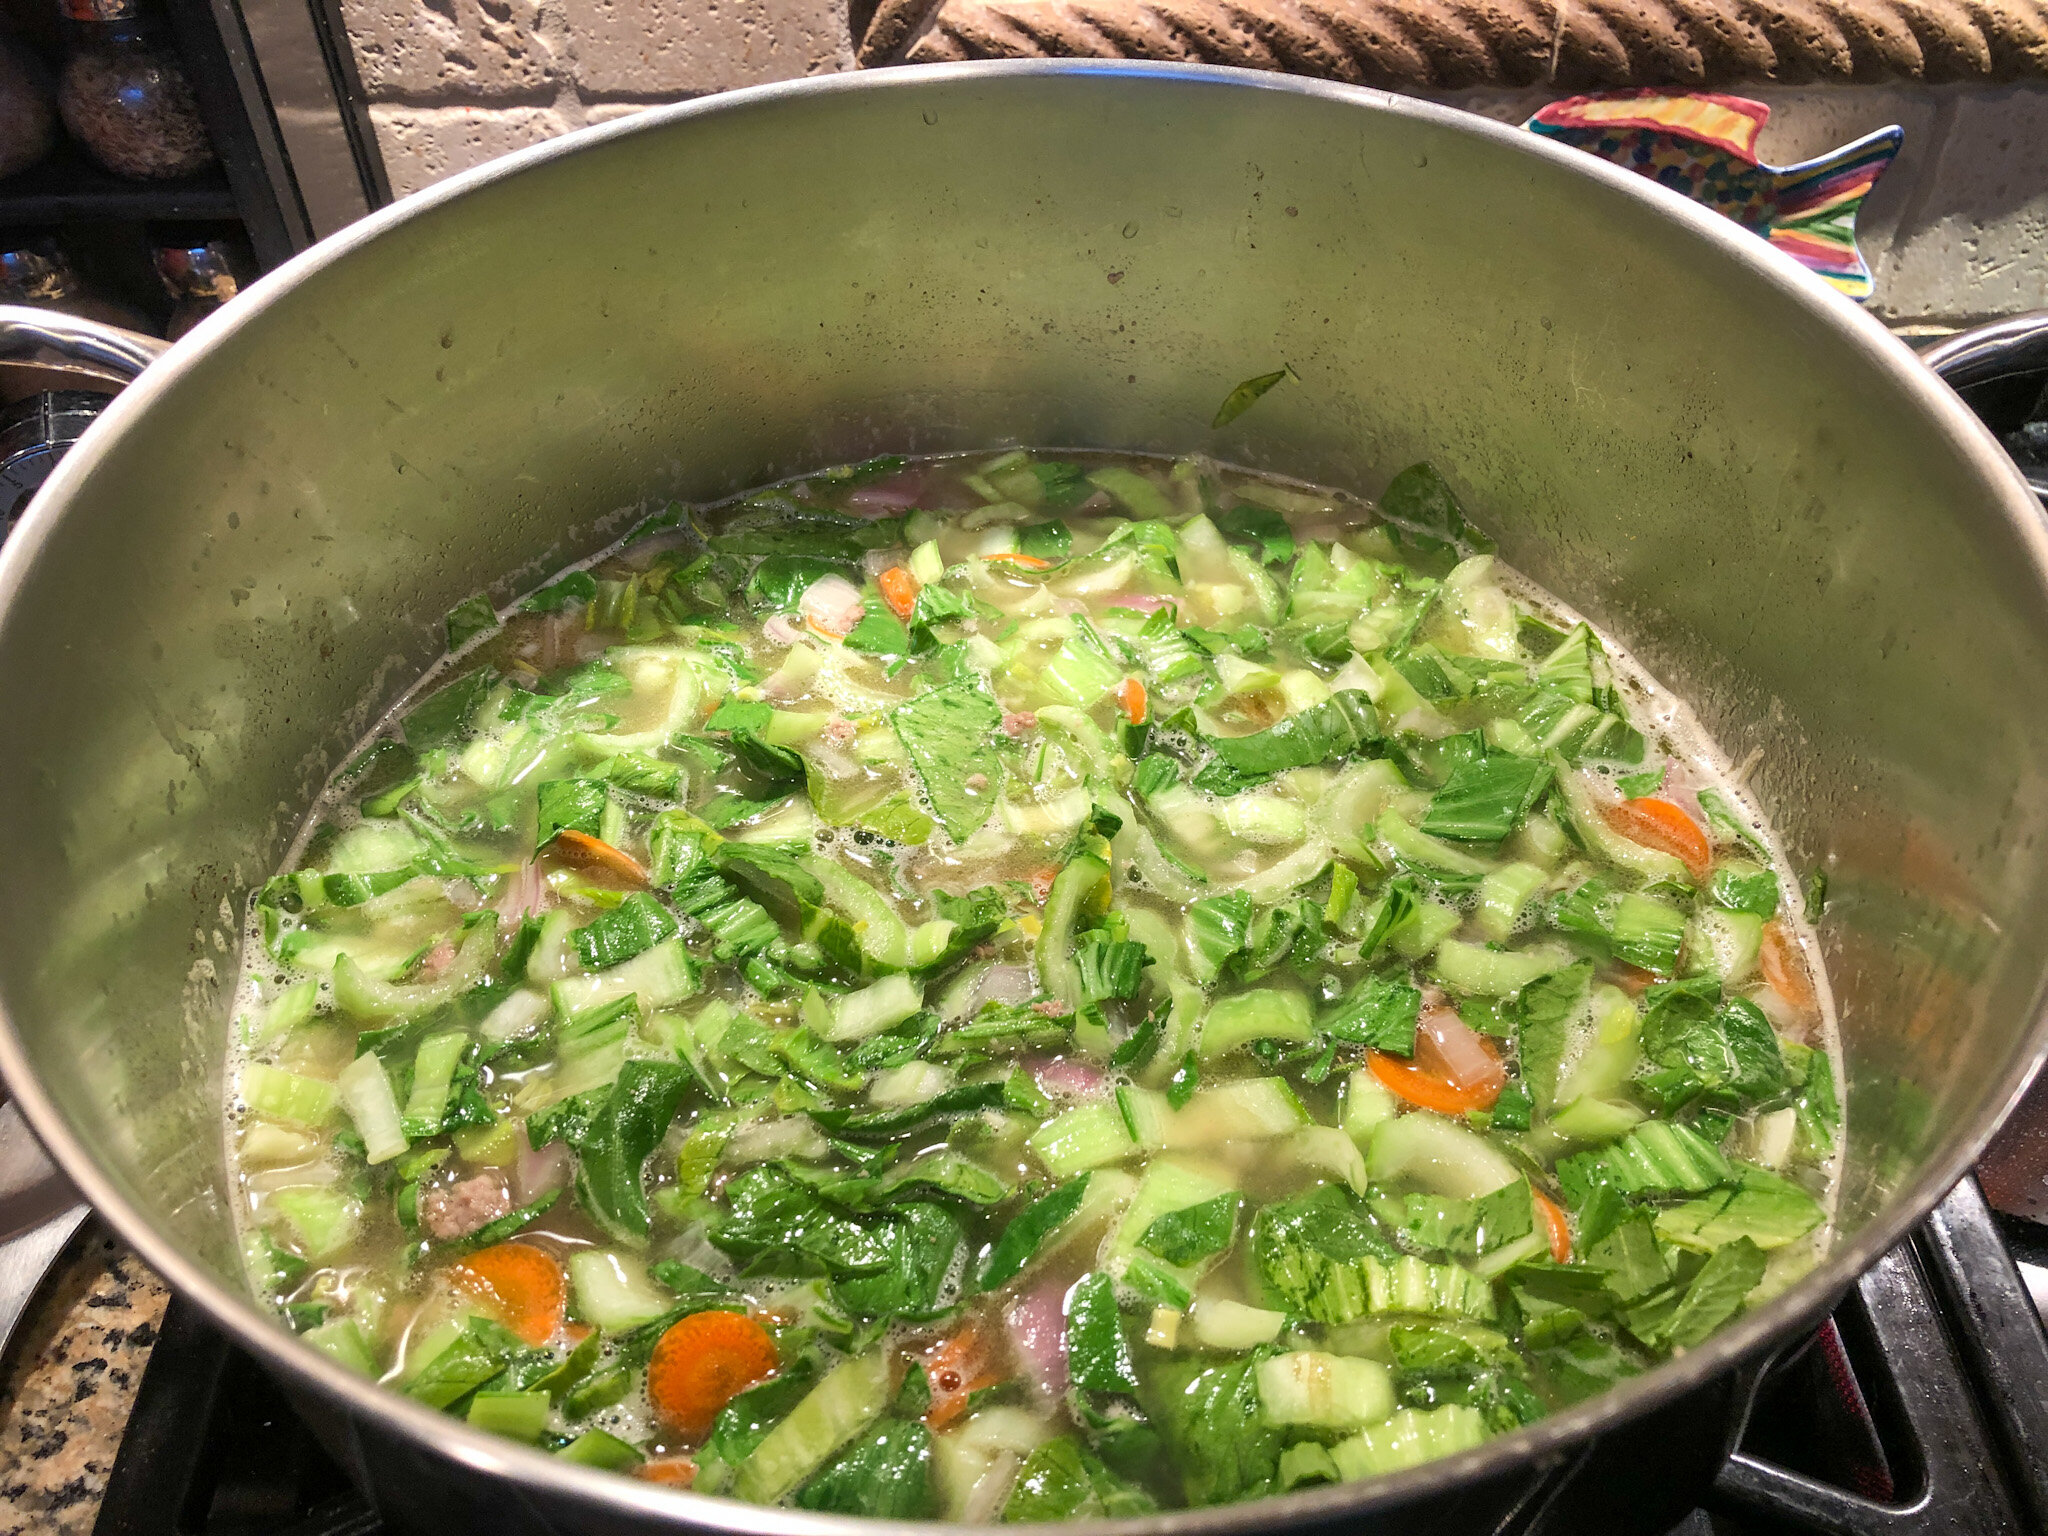 Making-Hanoi Ramen-noodle-soup.JPG